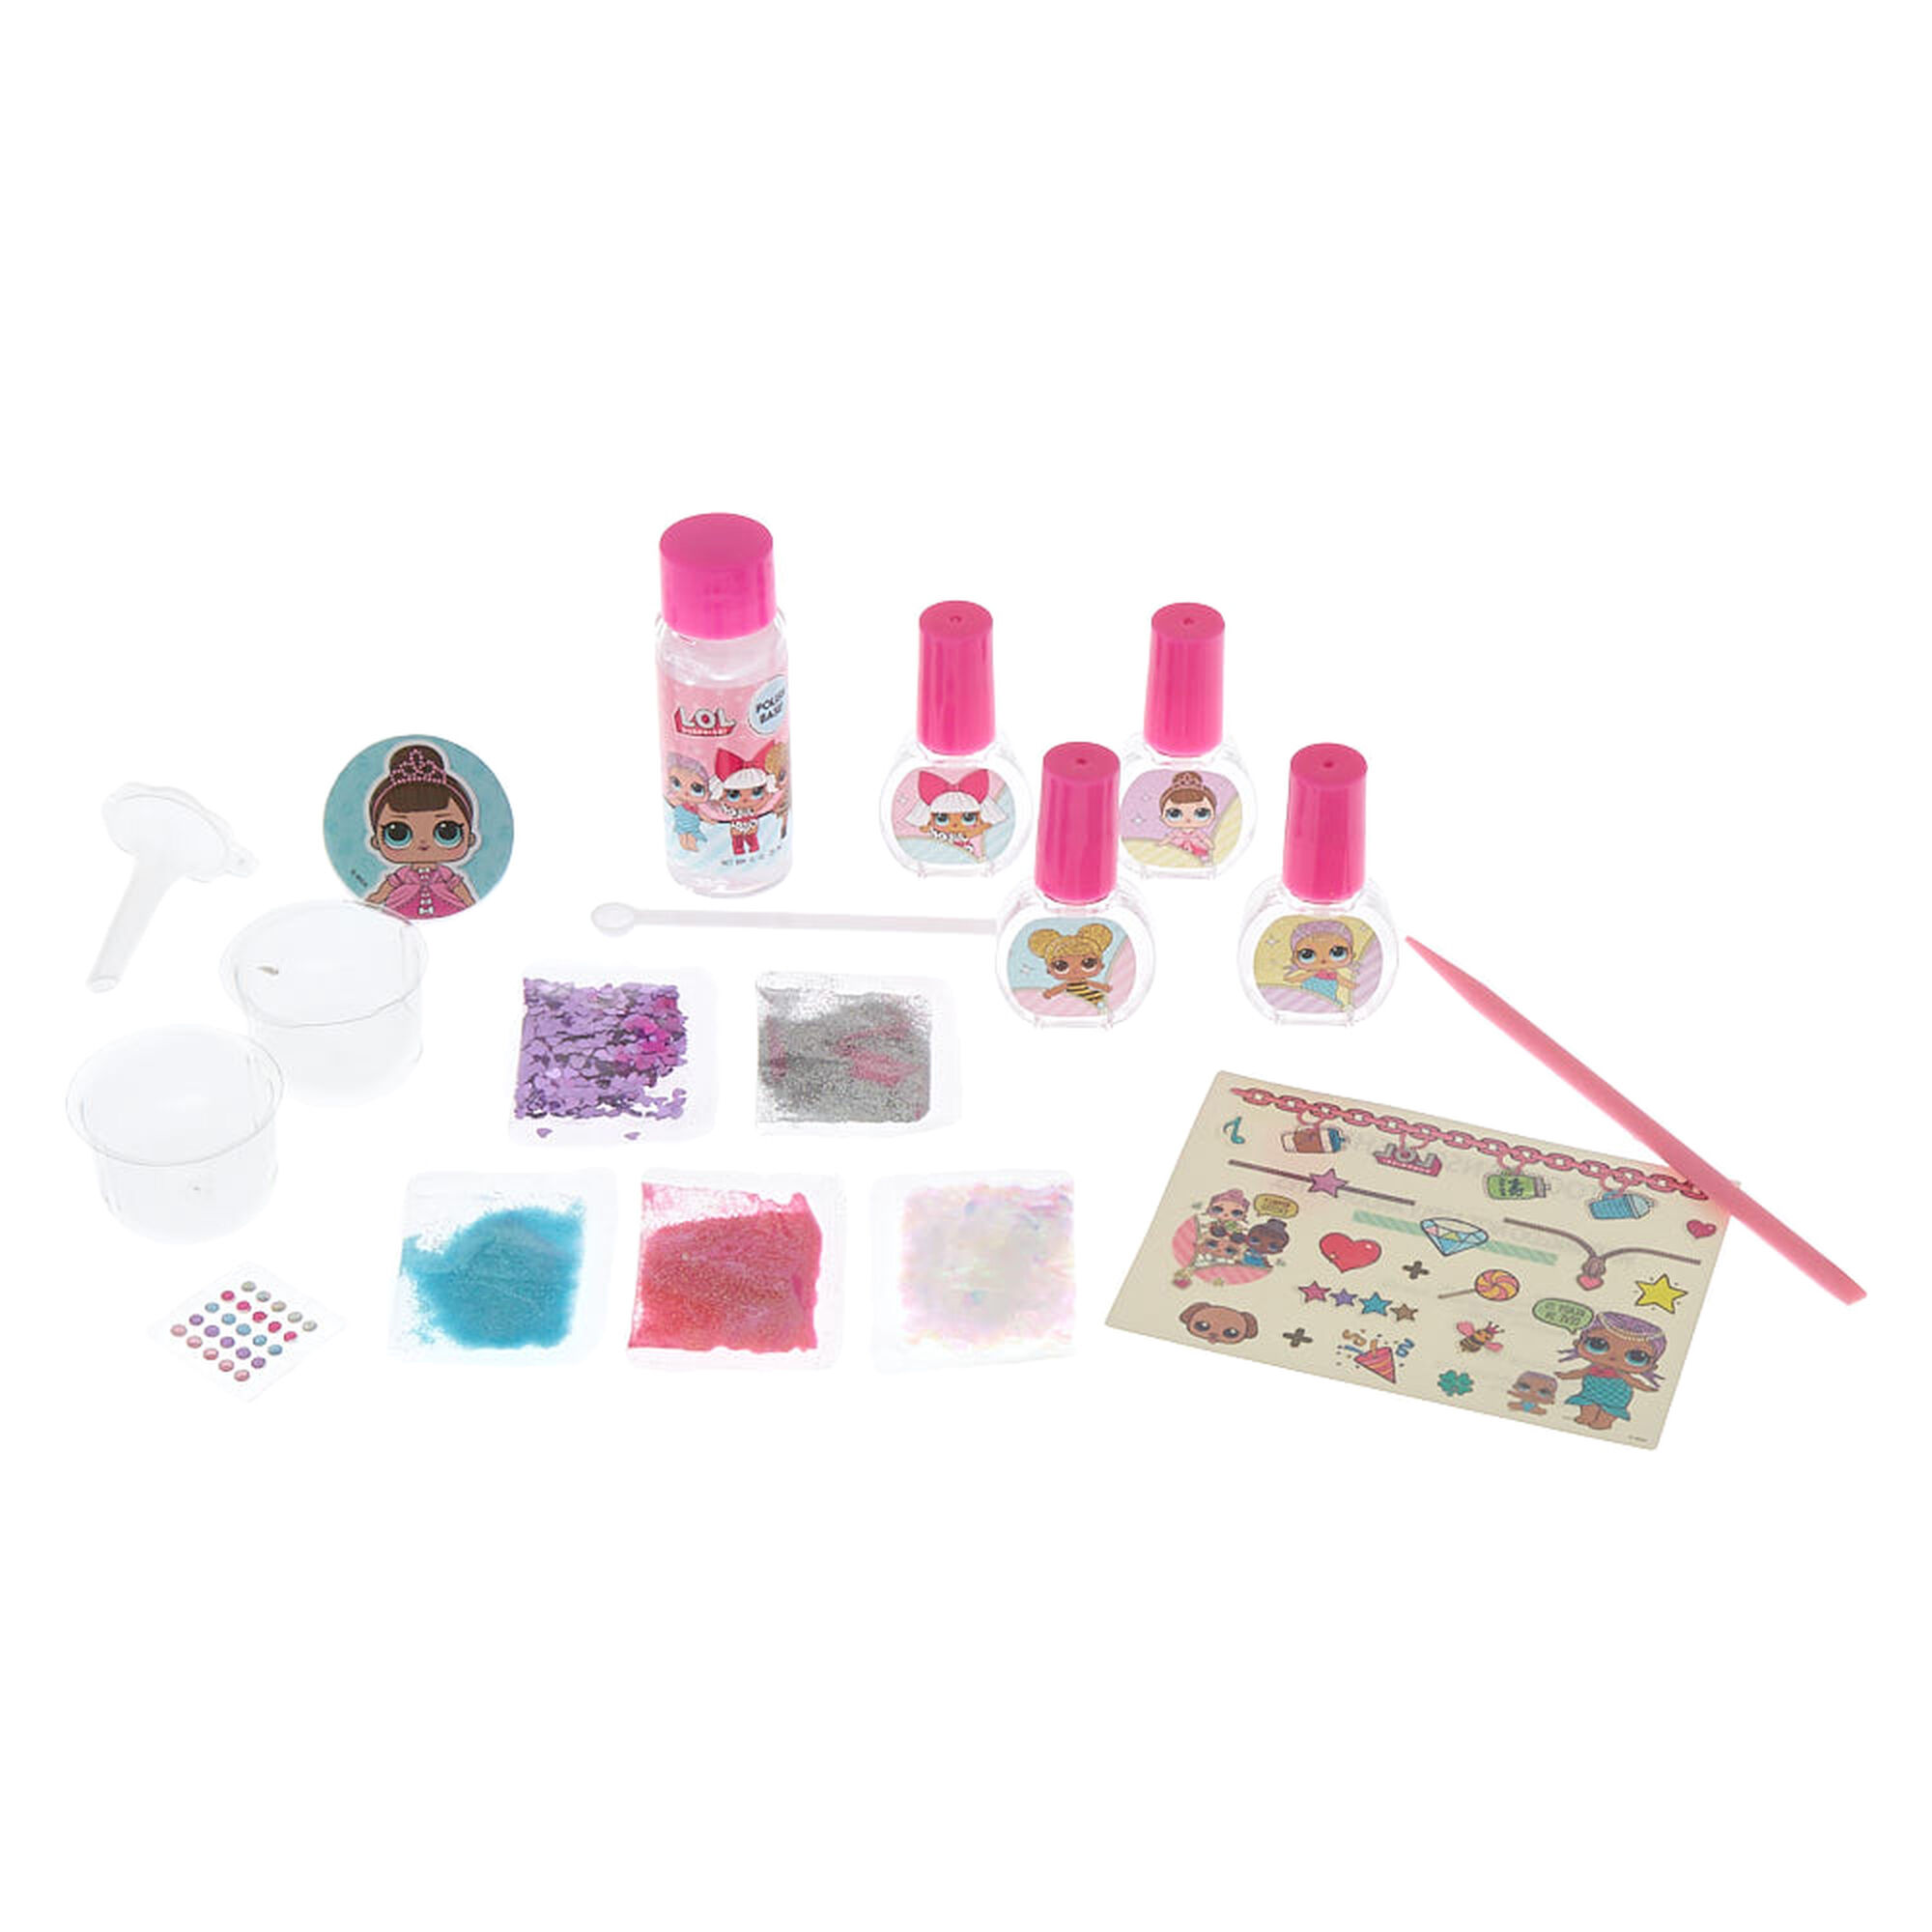 L.O.L Surprise!™ Confetti Nail Art Kit | Claire\'s US